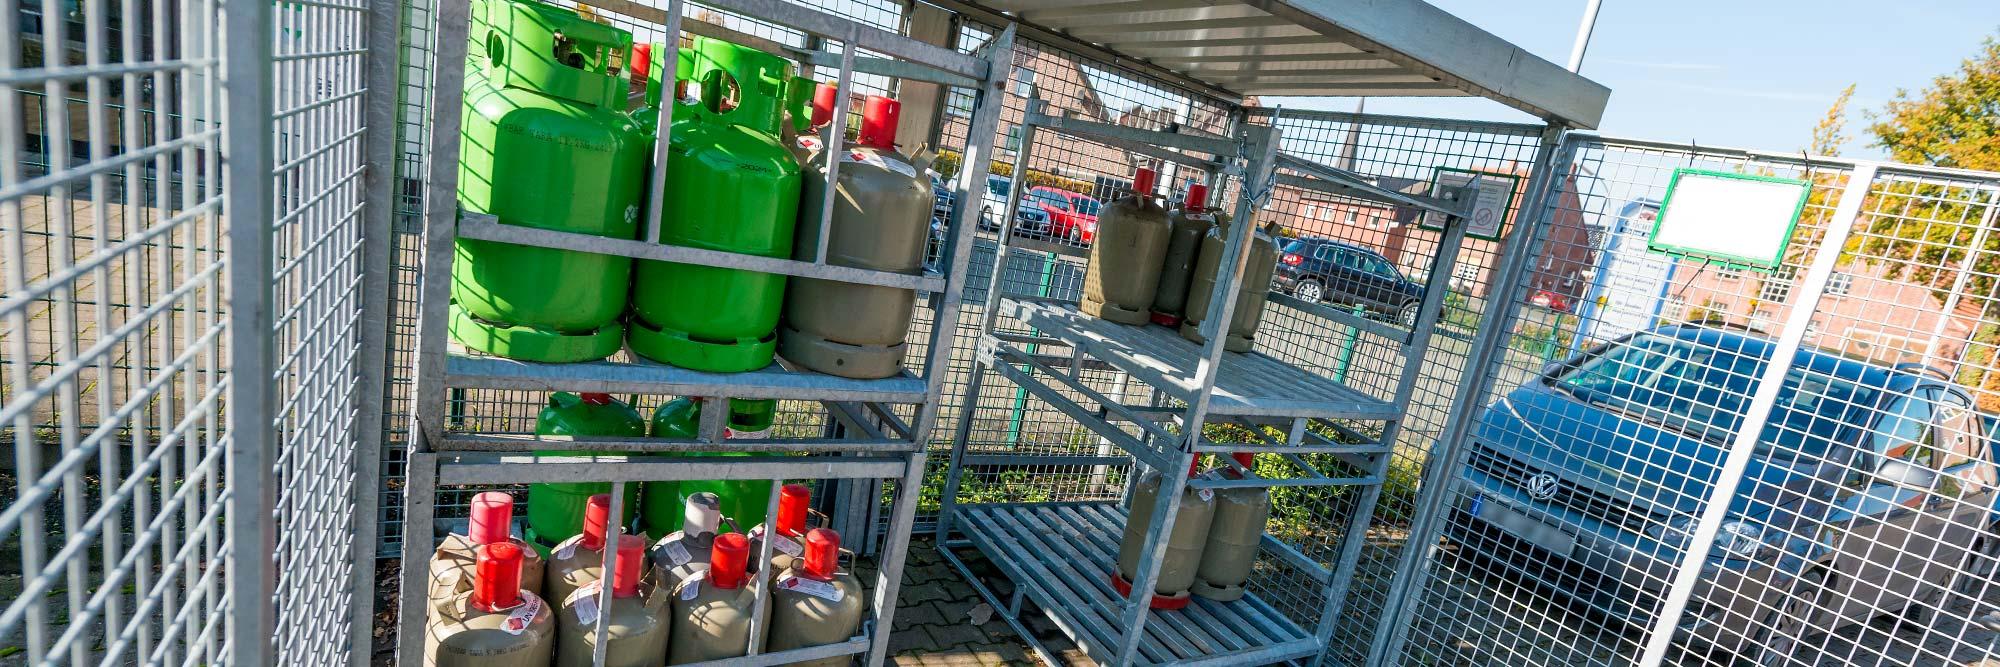 Raiffeisen Markt Ottmarsbocholt Gasverkauf